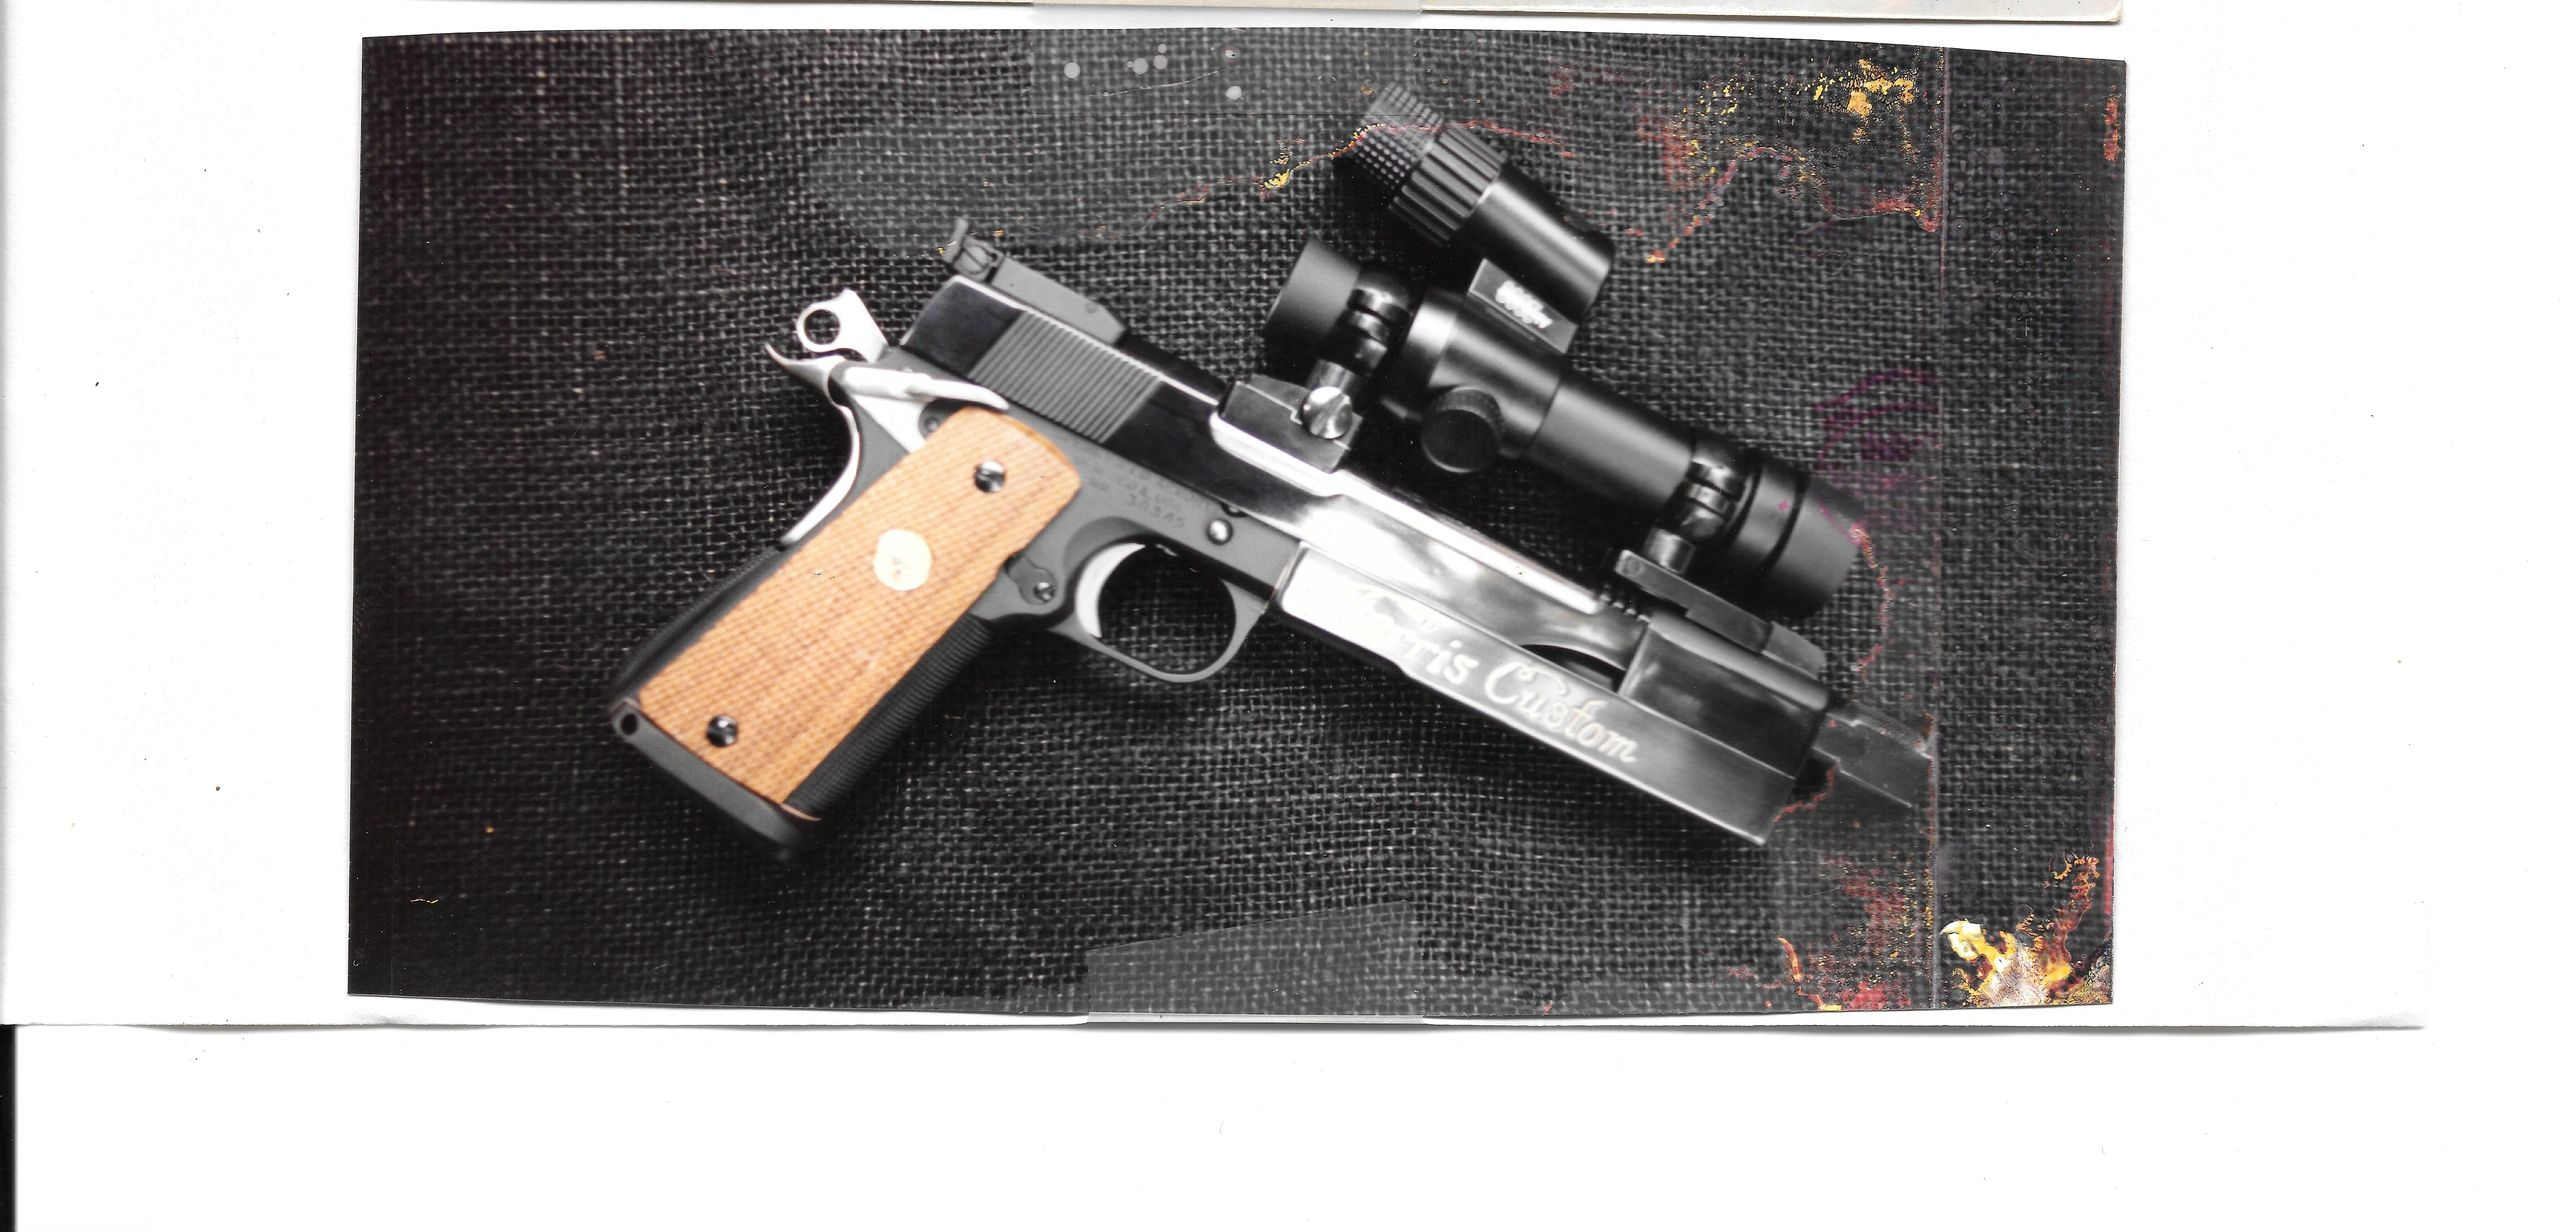 Ferris Firearms - Hodgdon Powder, Rifle Powder Pistol Powder